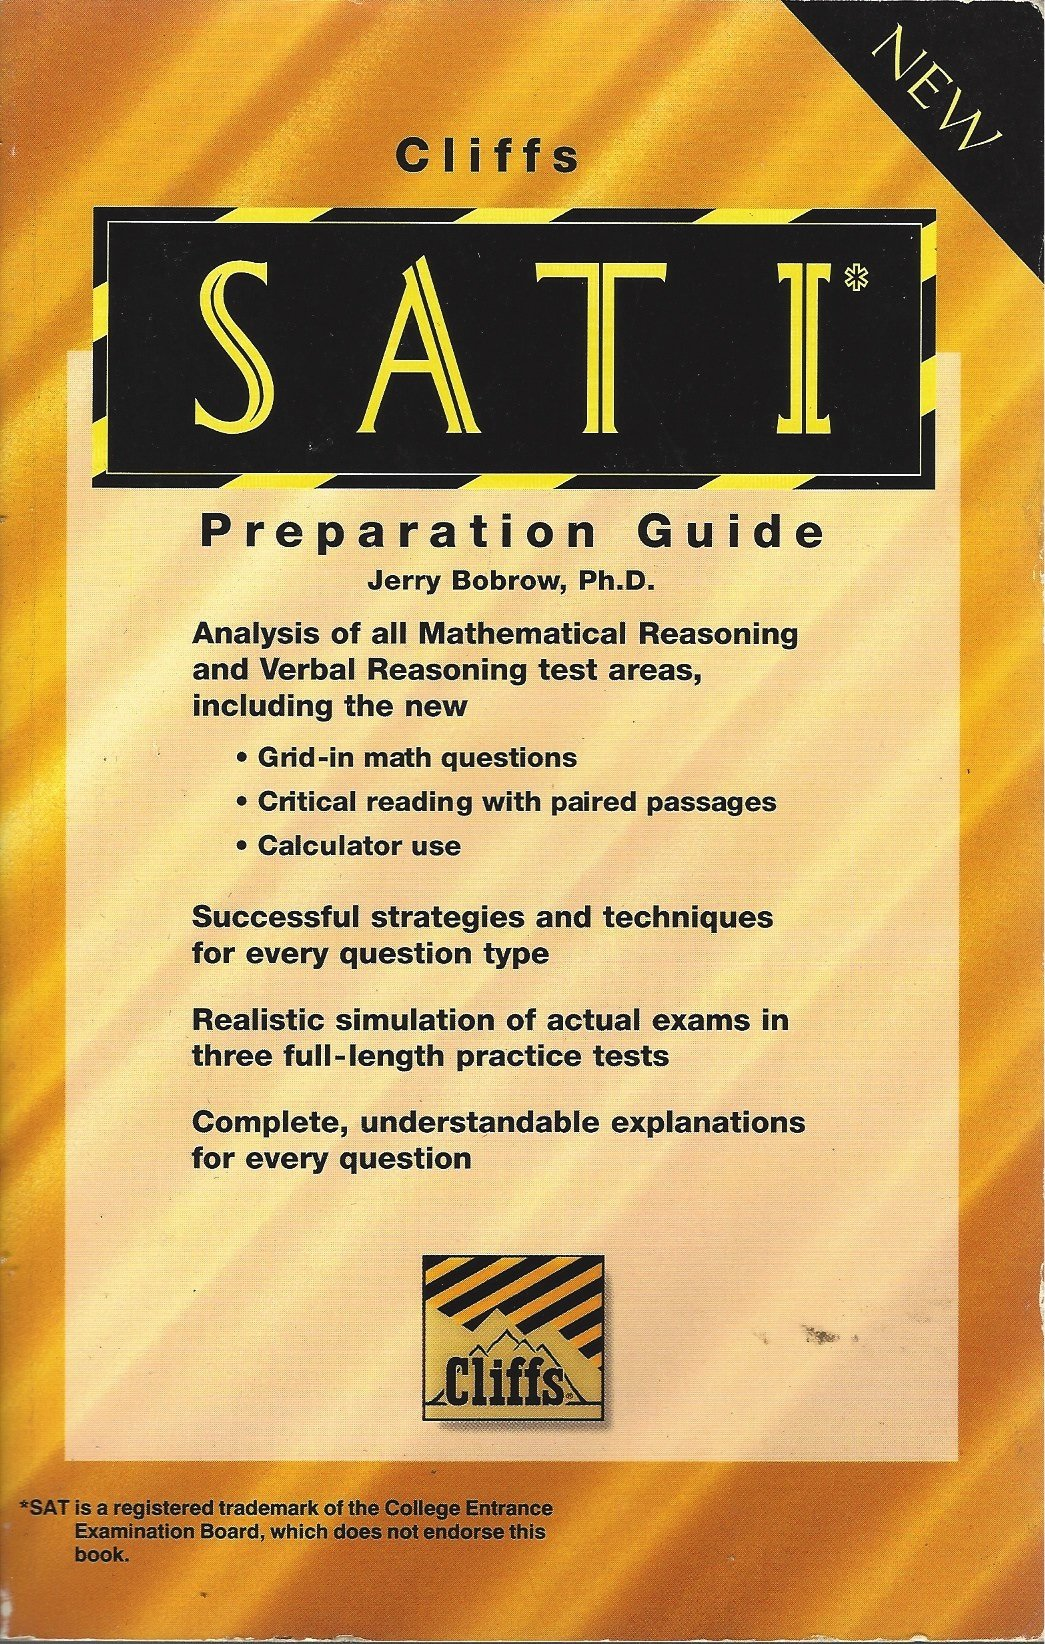 Cliffs Sat I Reasoning Test Preparation Guide: Jerry Ph.D. Bobrow:  9780822020745: Amazon.com: Books